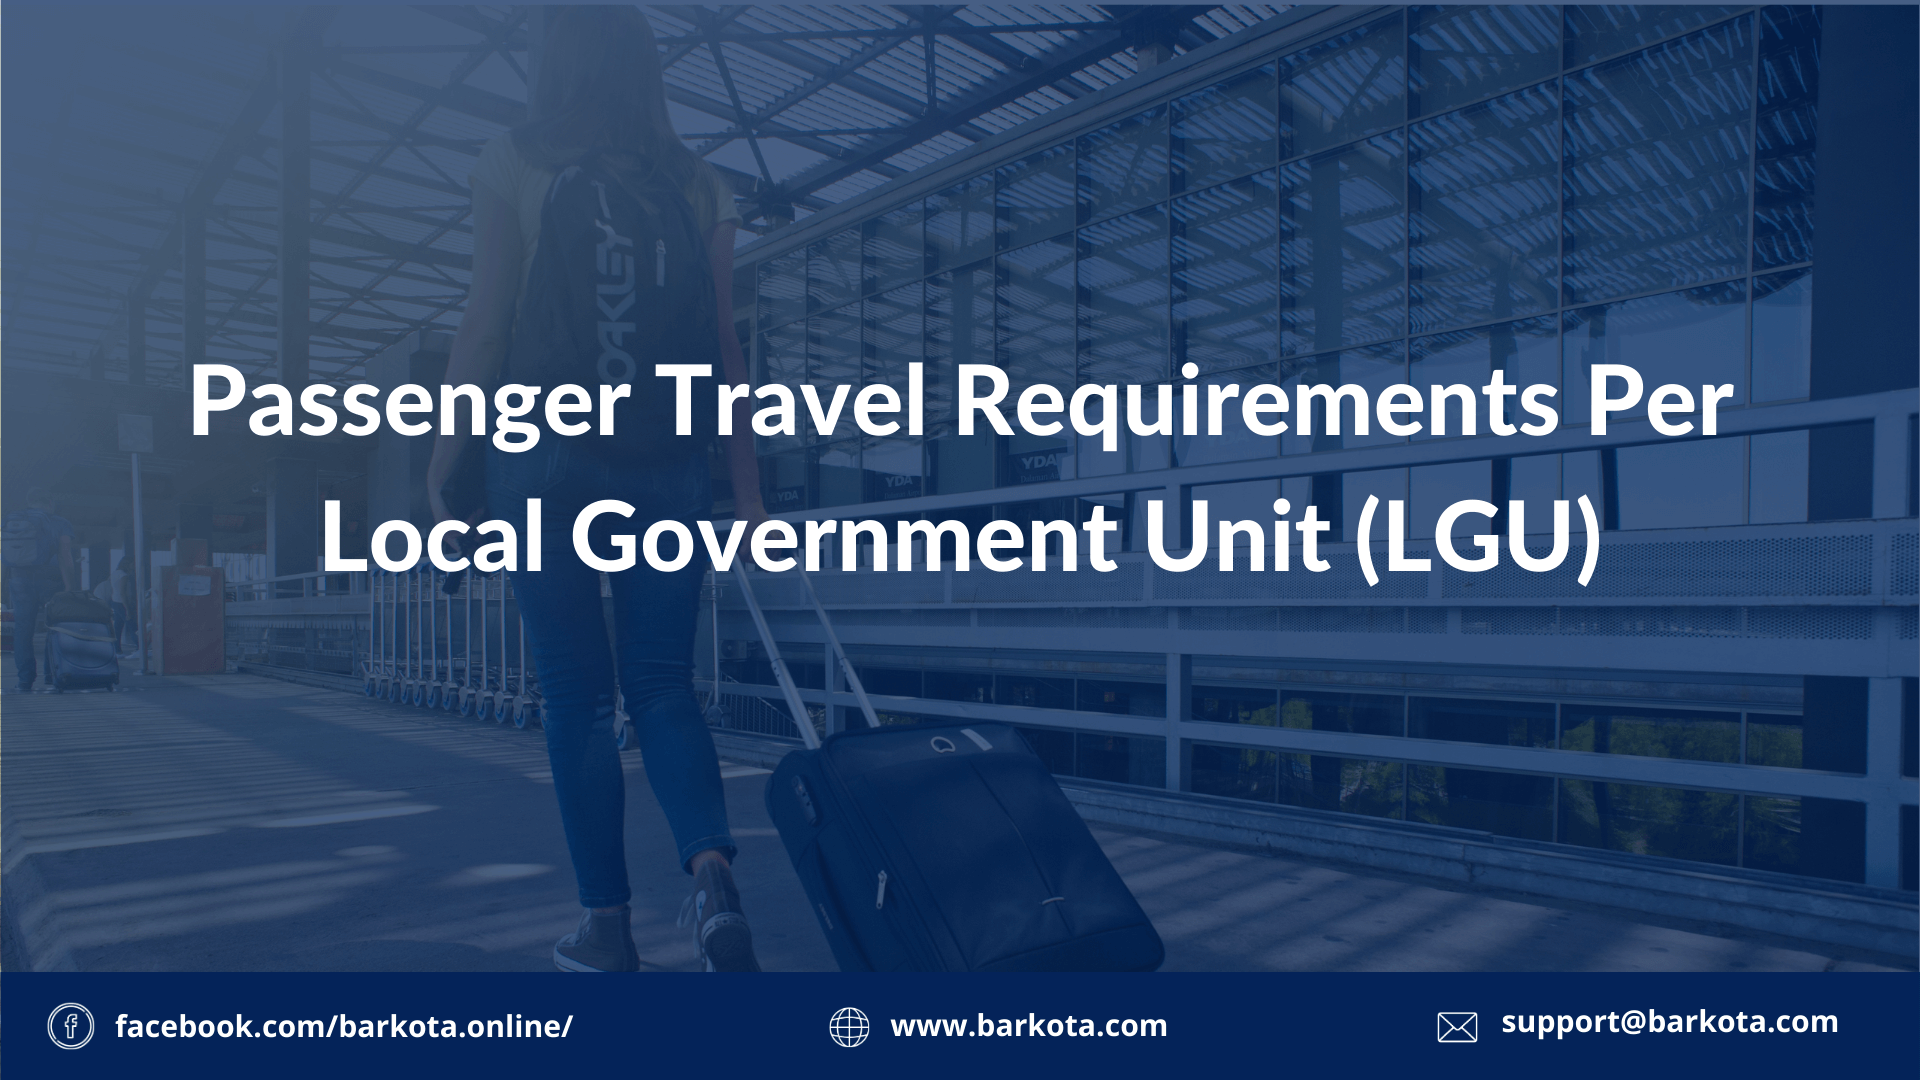 Travel Requirements per LGU